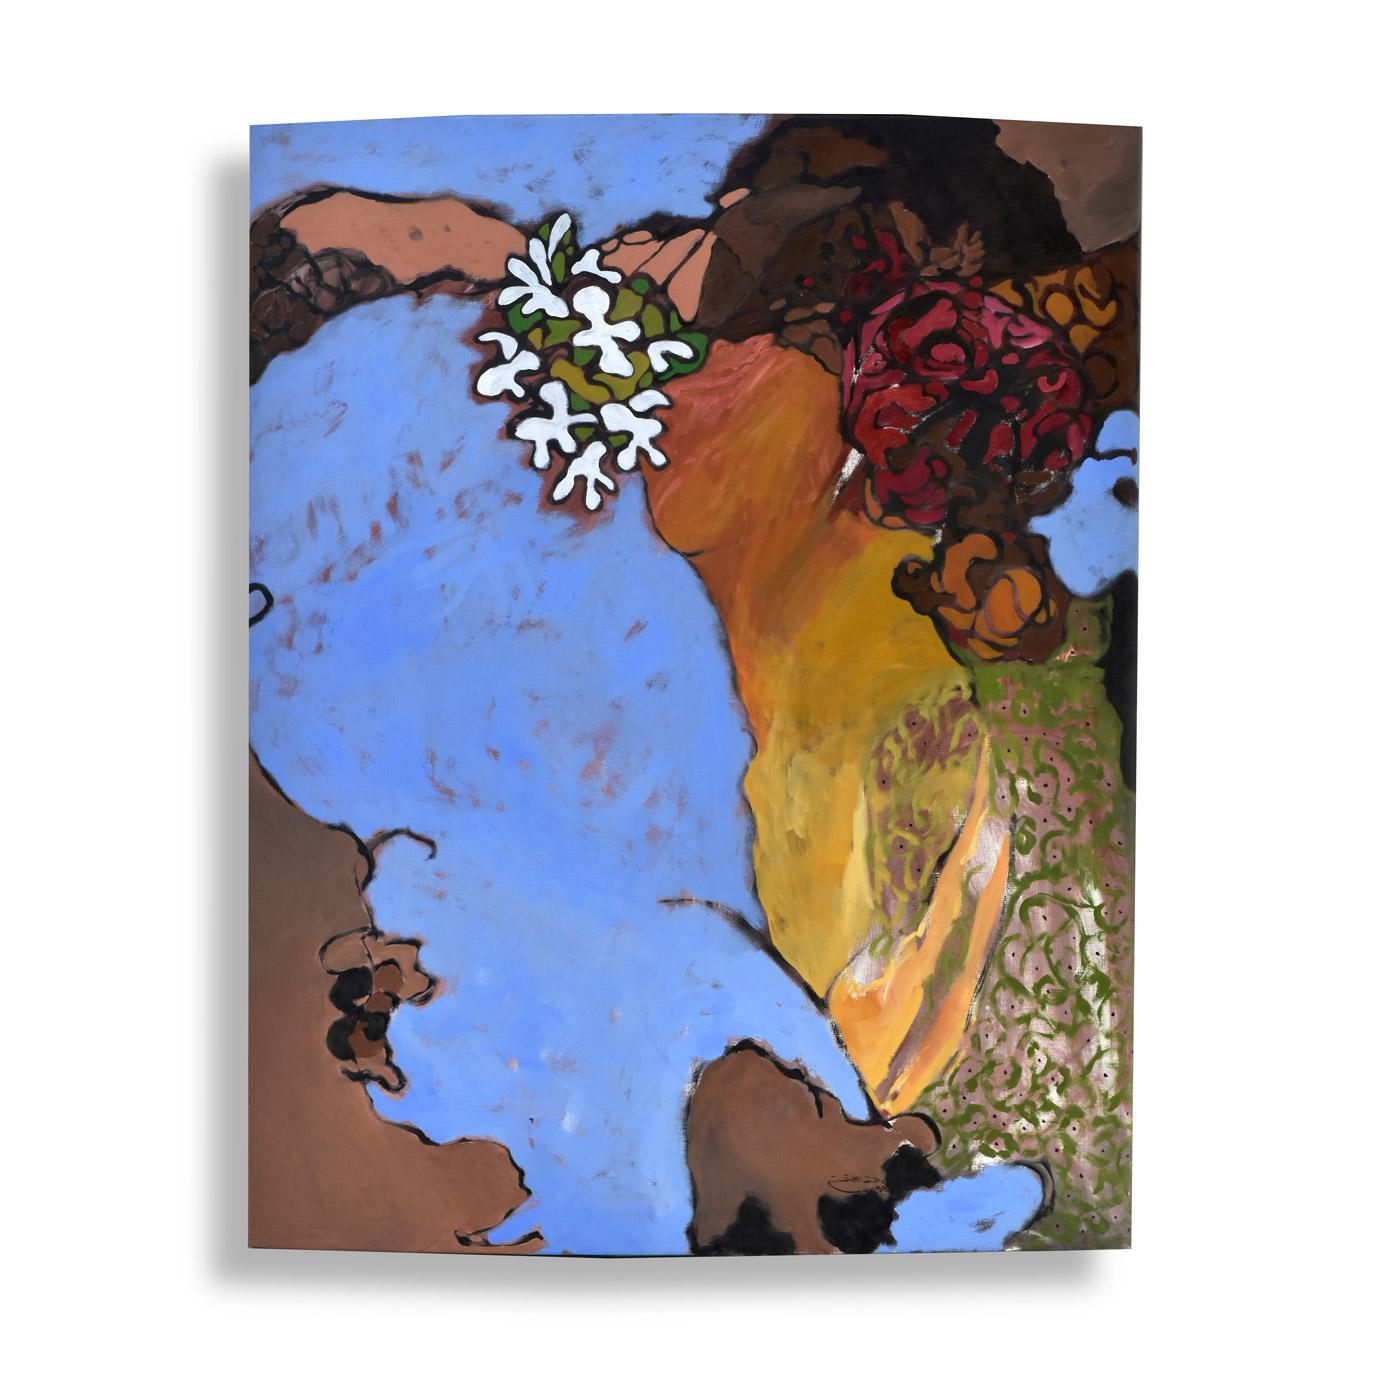 Figurative-Landscape-III_1998_Oil-on-canvas_145-x-115-cm